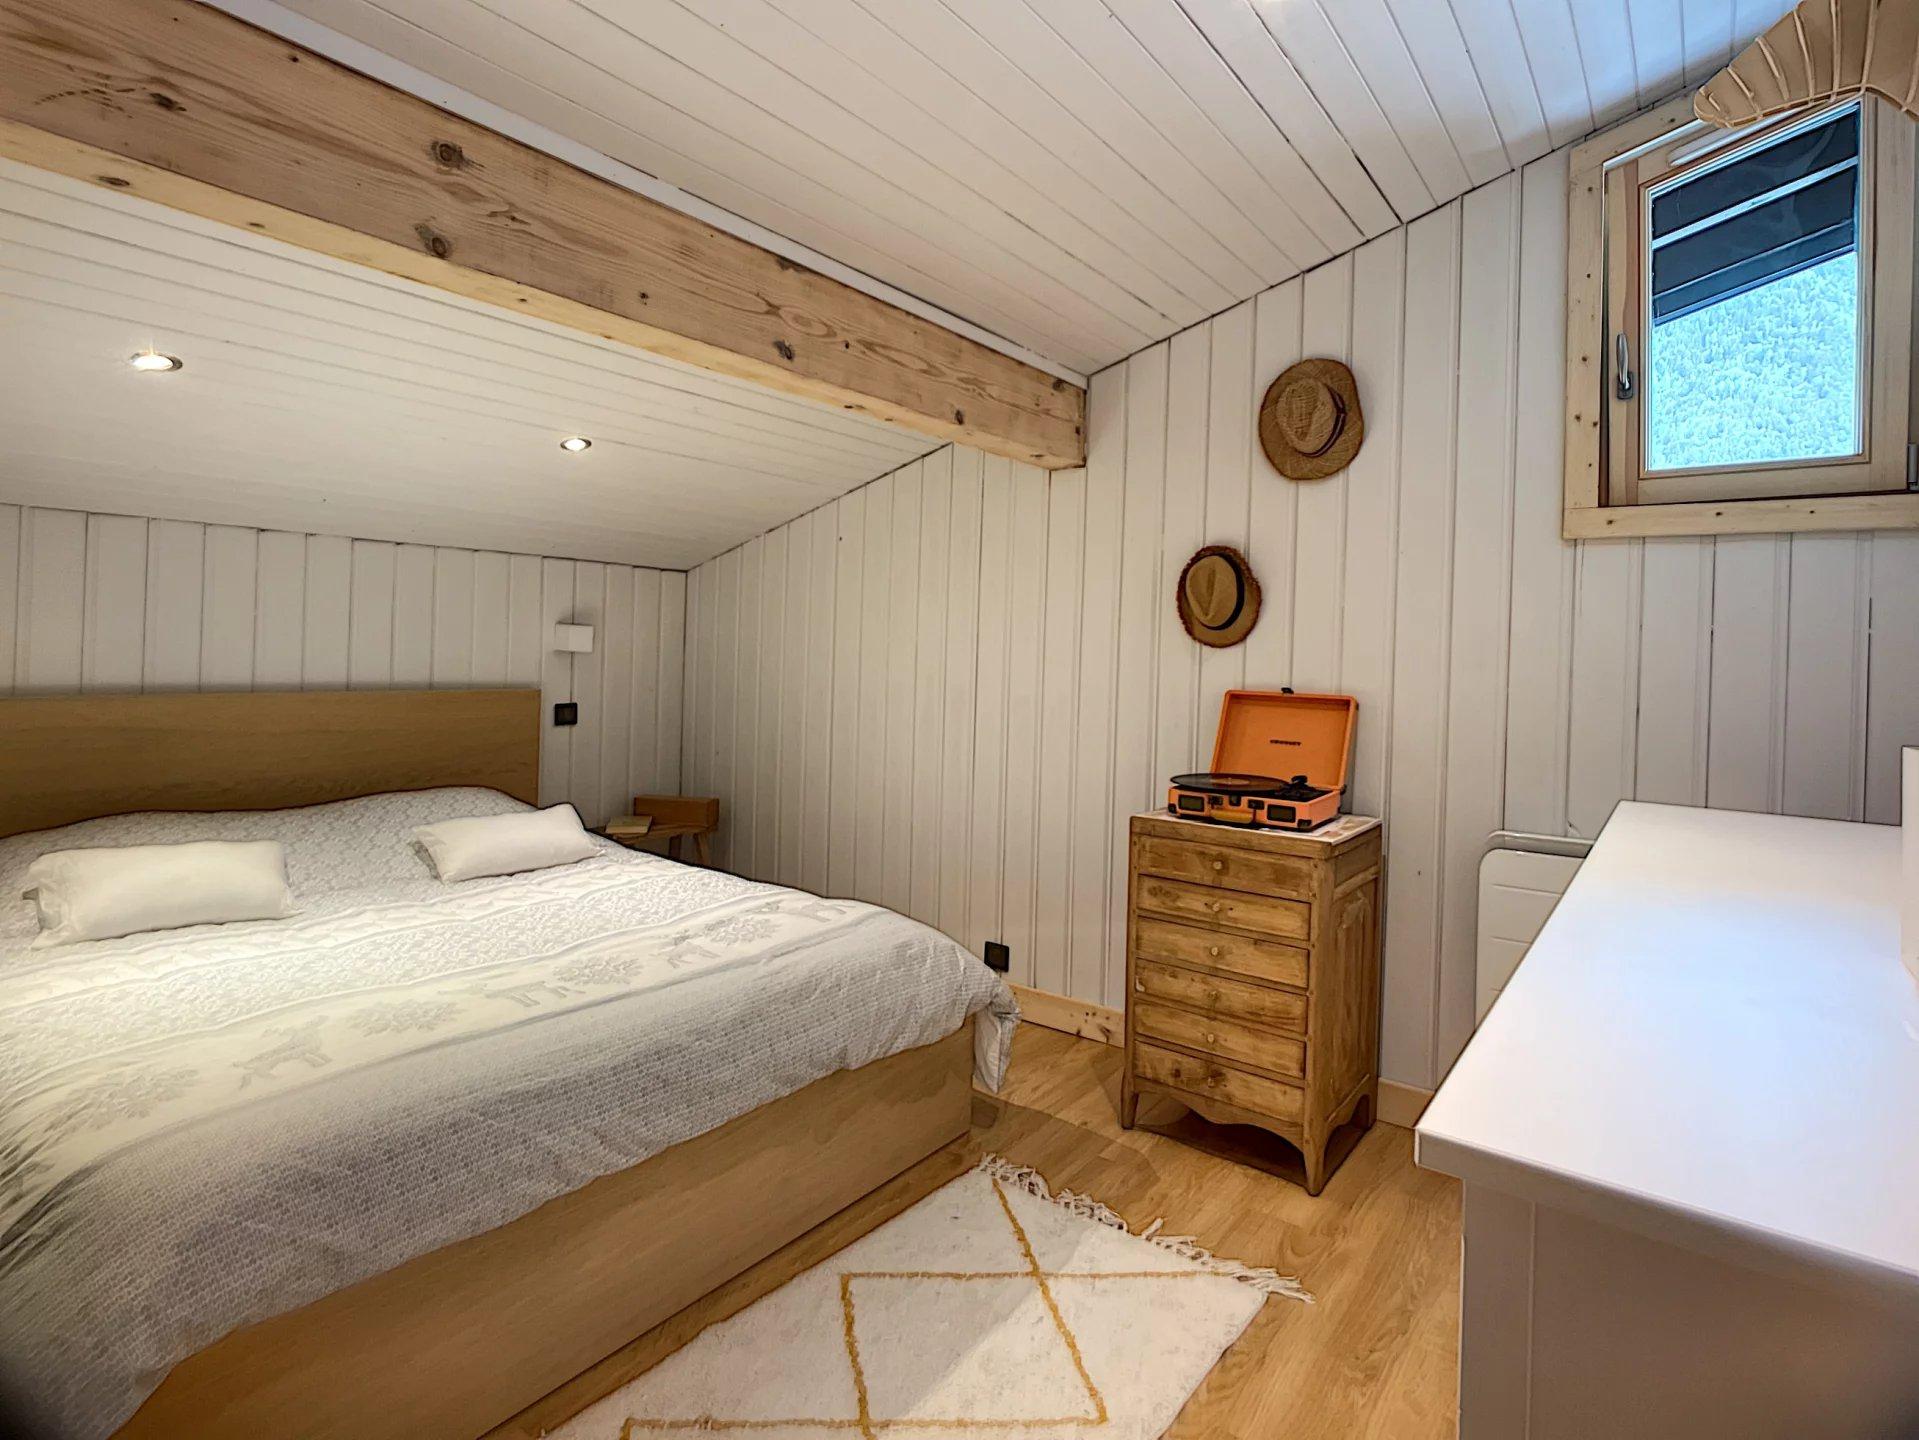 Appartement 2 chambres jardin Chamonix Mont-Blanc